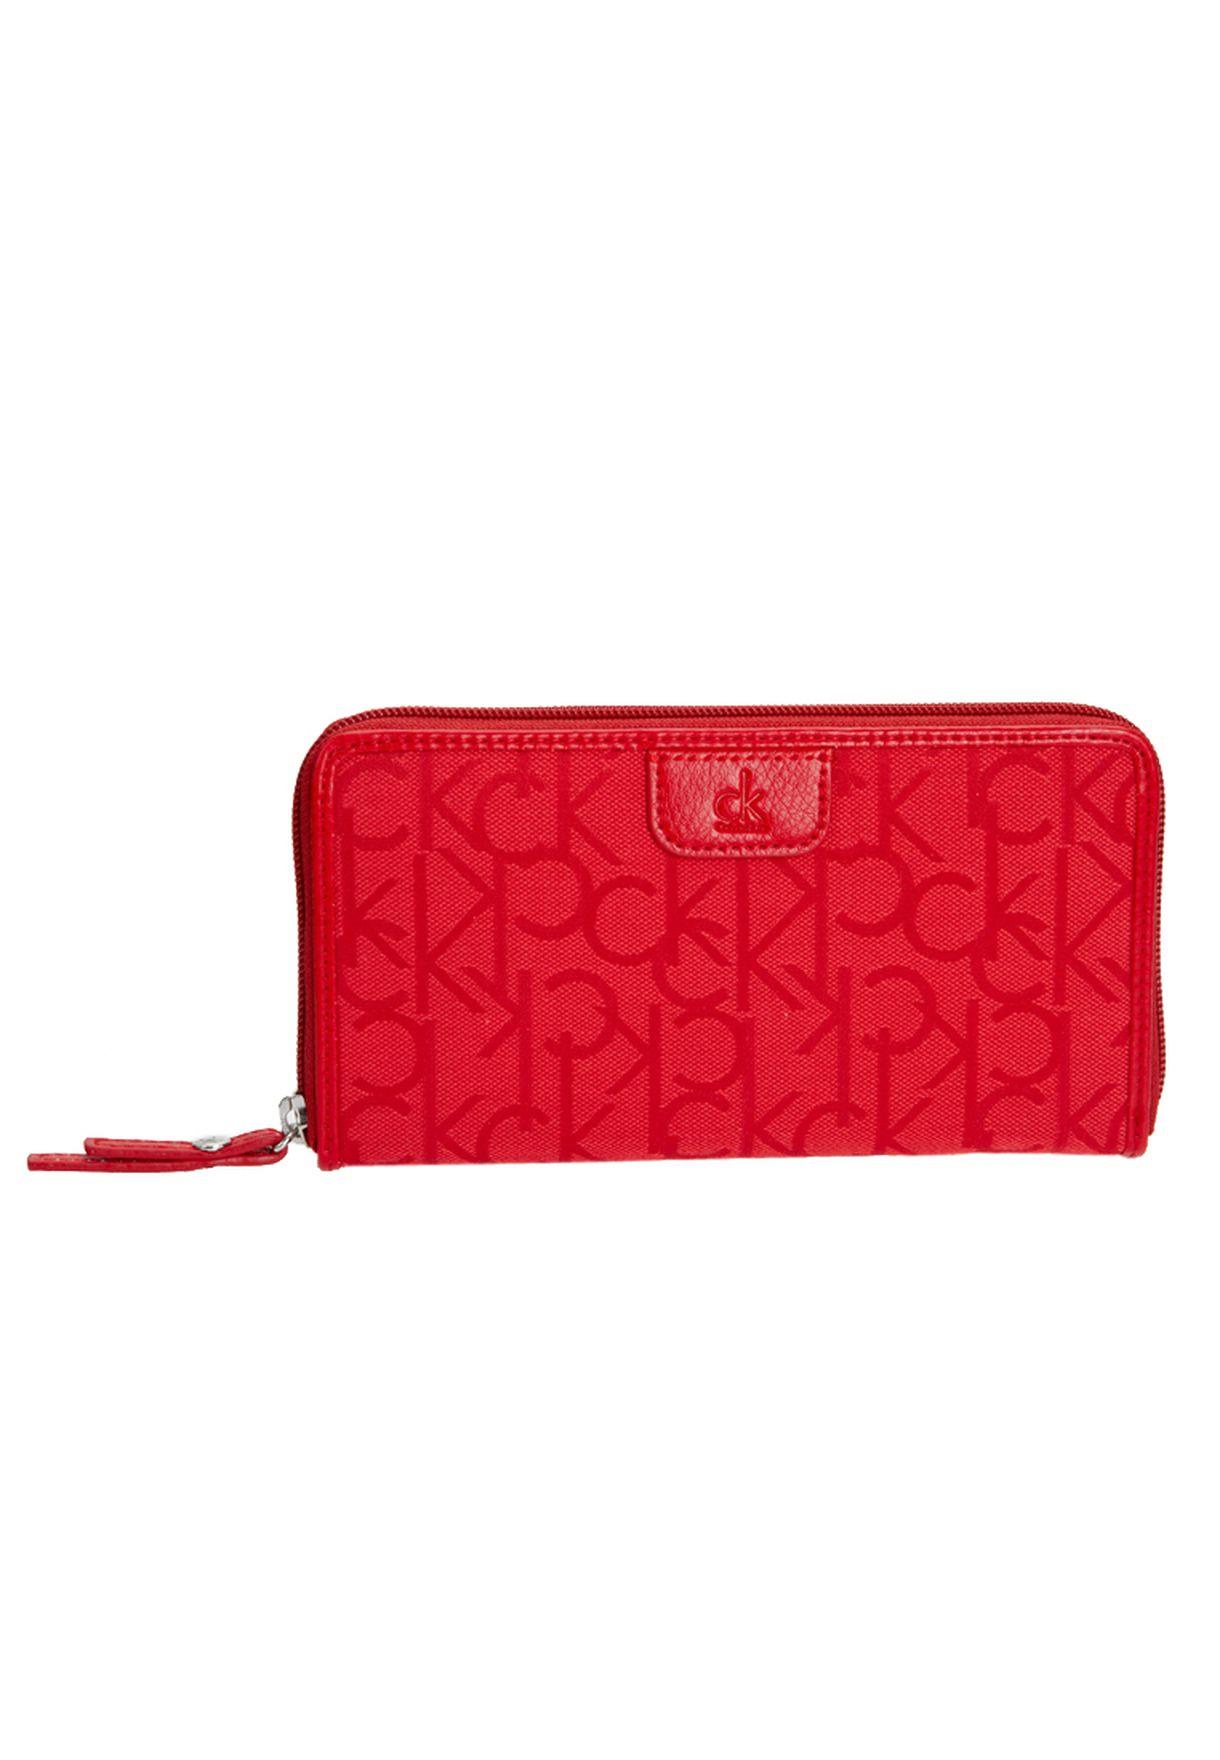 b38cfde53 تسوق Purse ماركة كالفن كلاين جينز لون أحمر في قطر - CA294AC01KSS